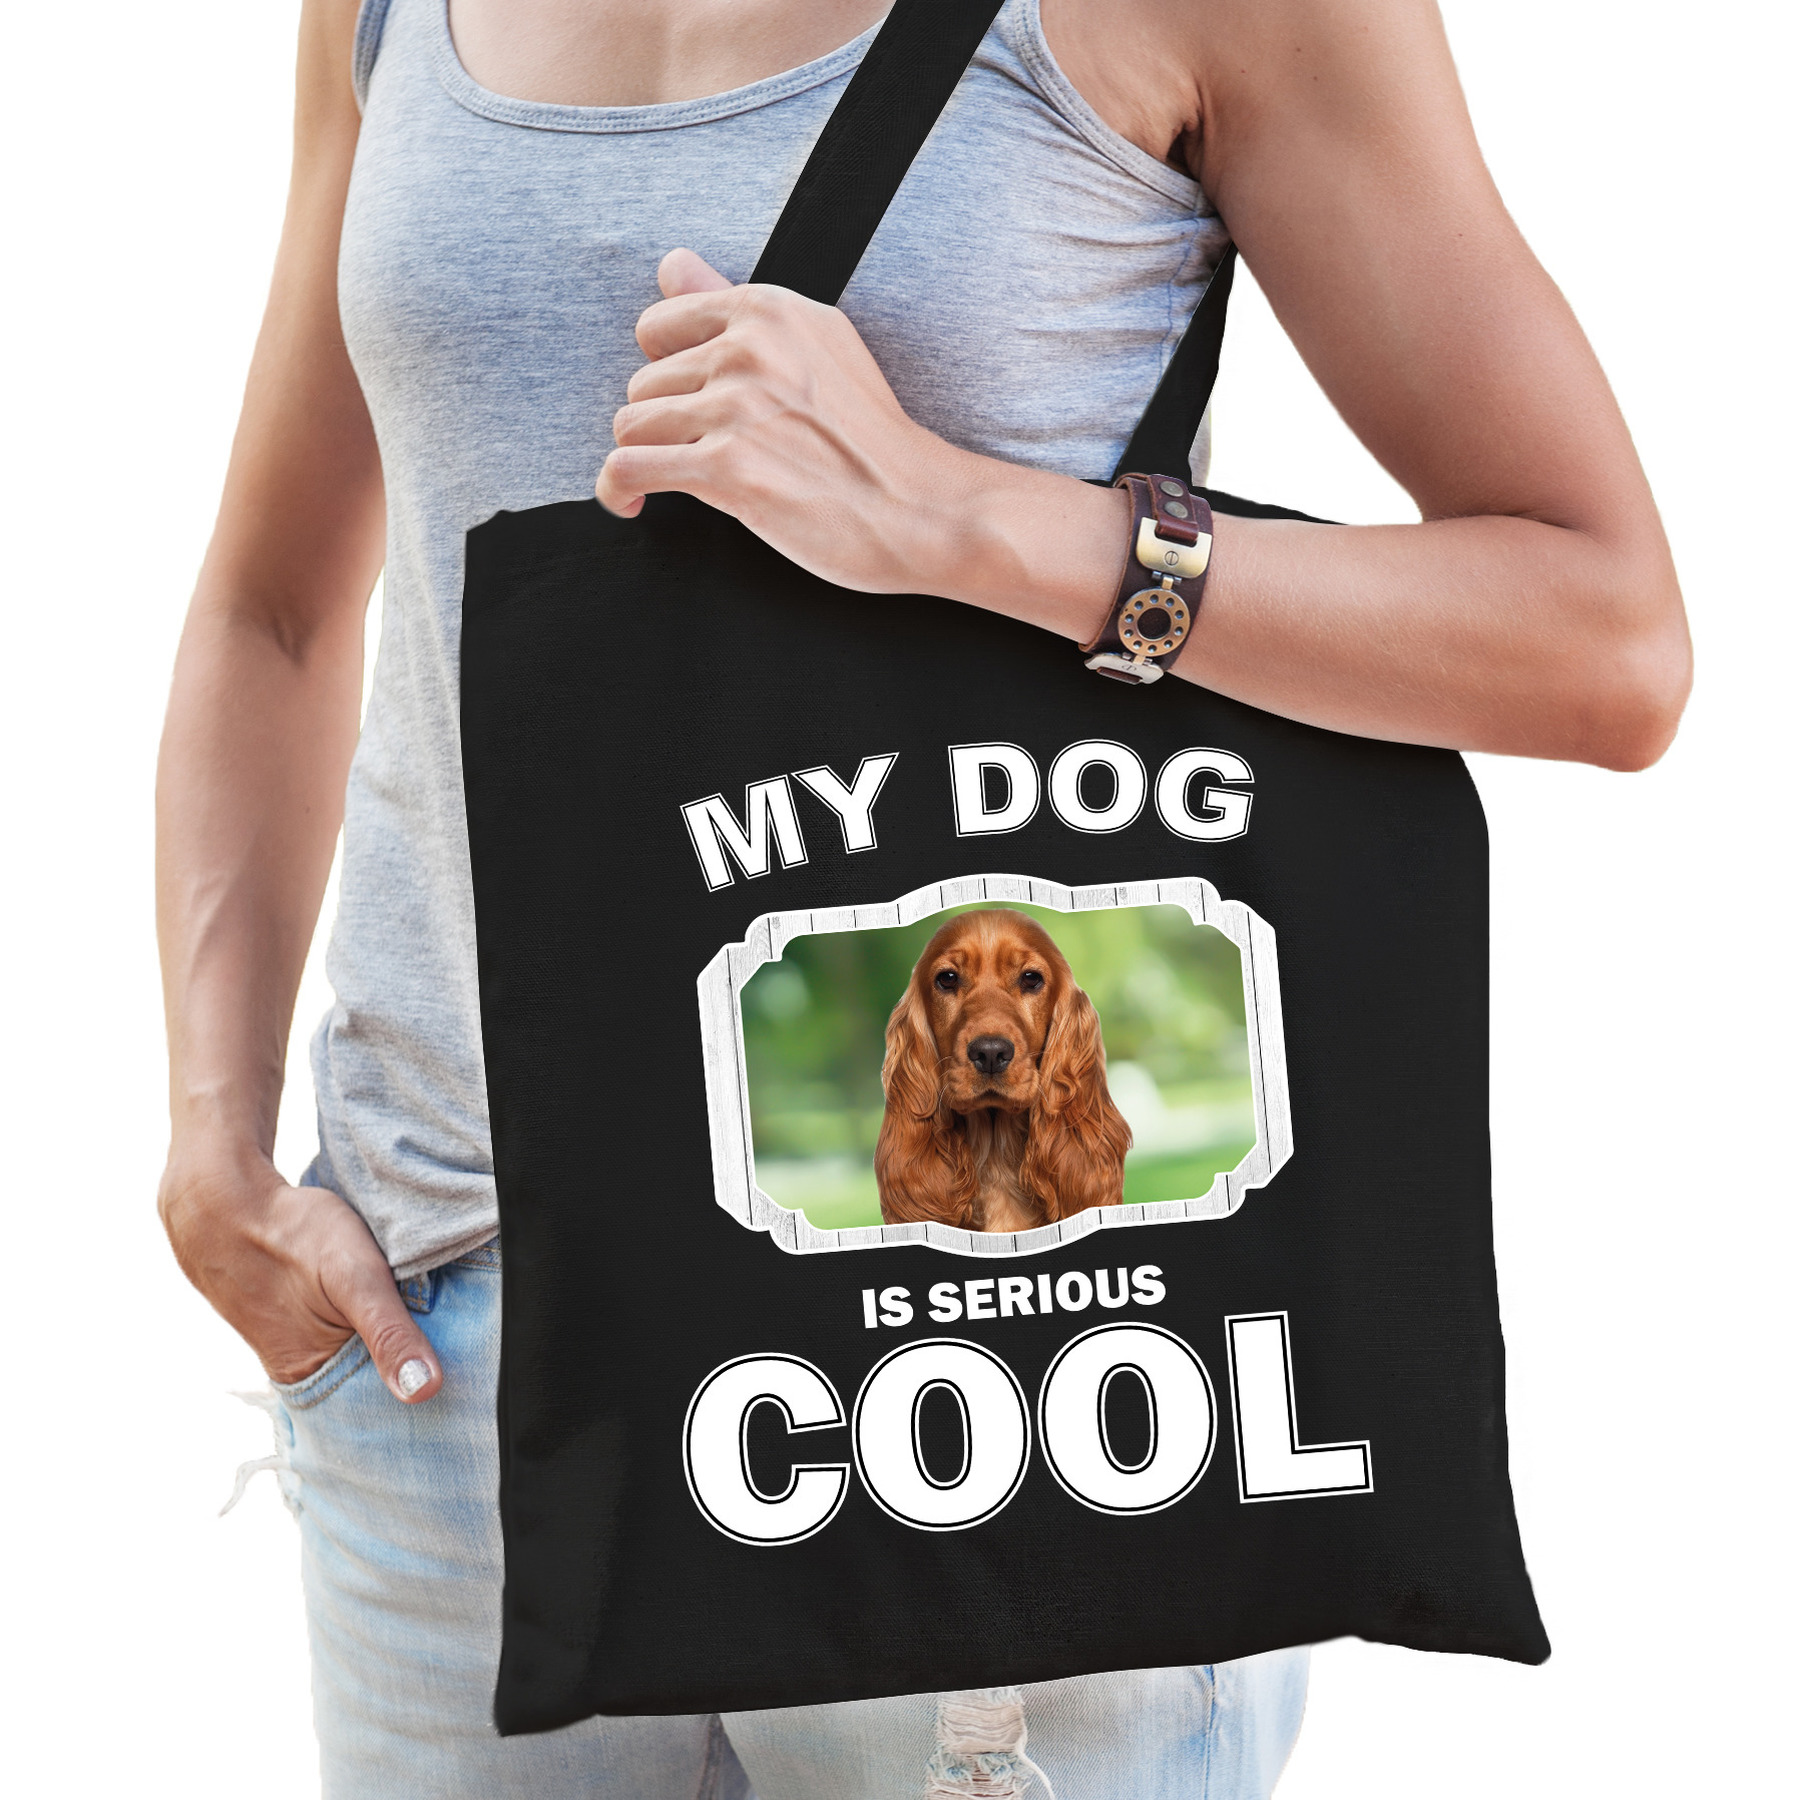 Katoenen tasje my dog is serious cool zwart - Spaniel honden cadeau tas